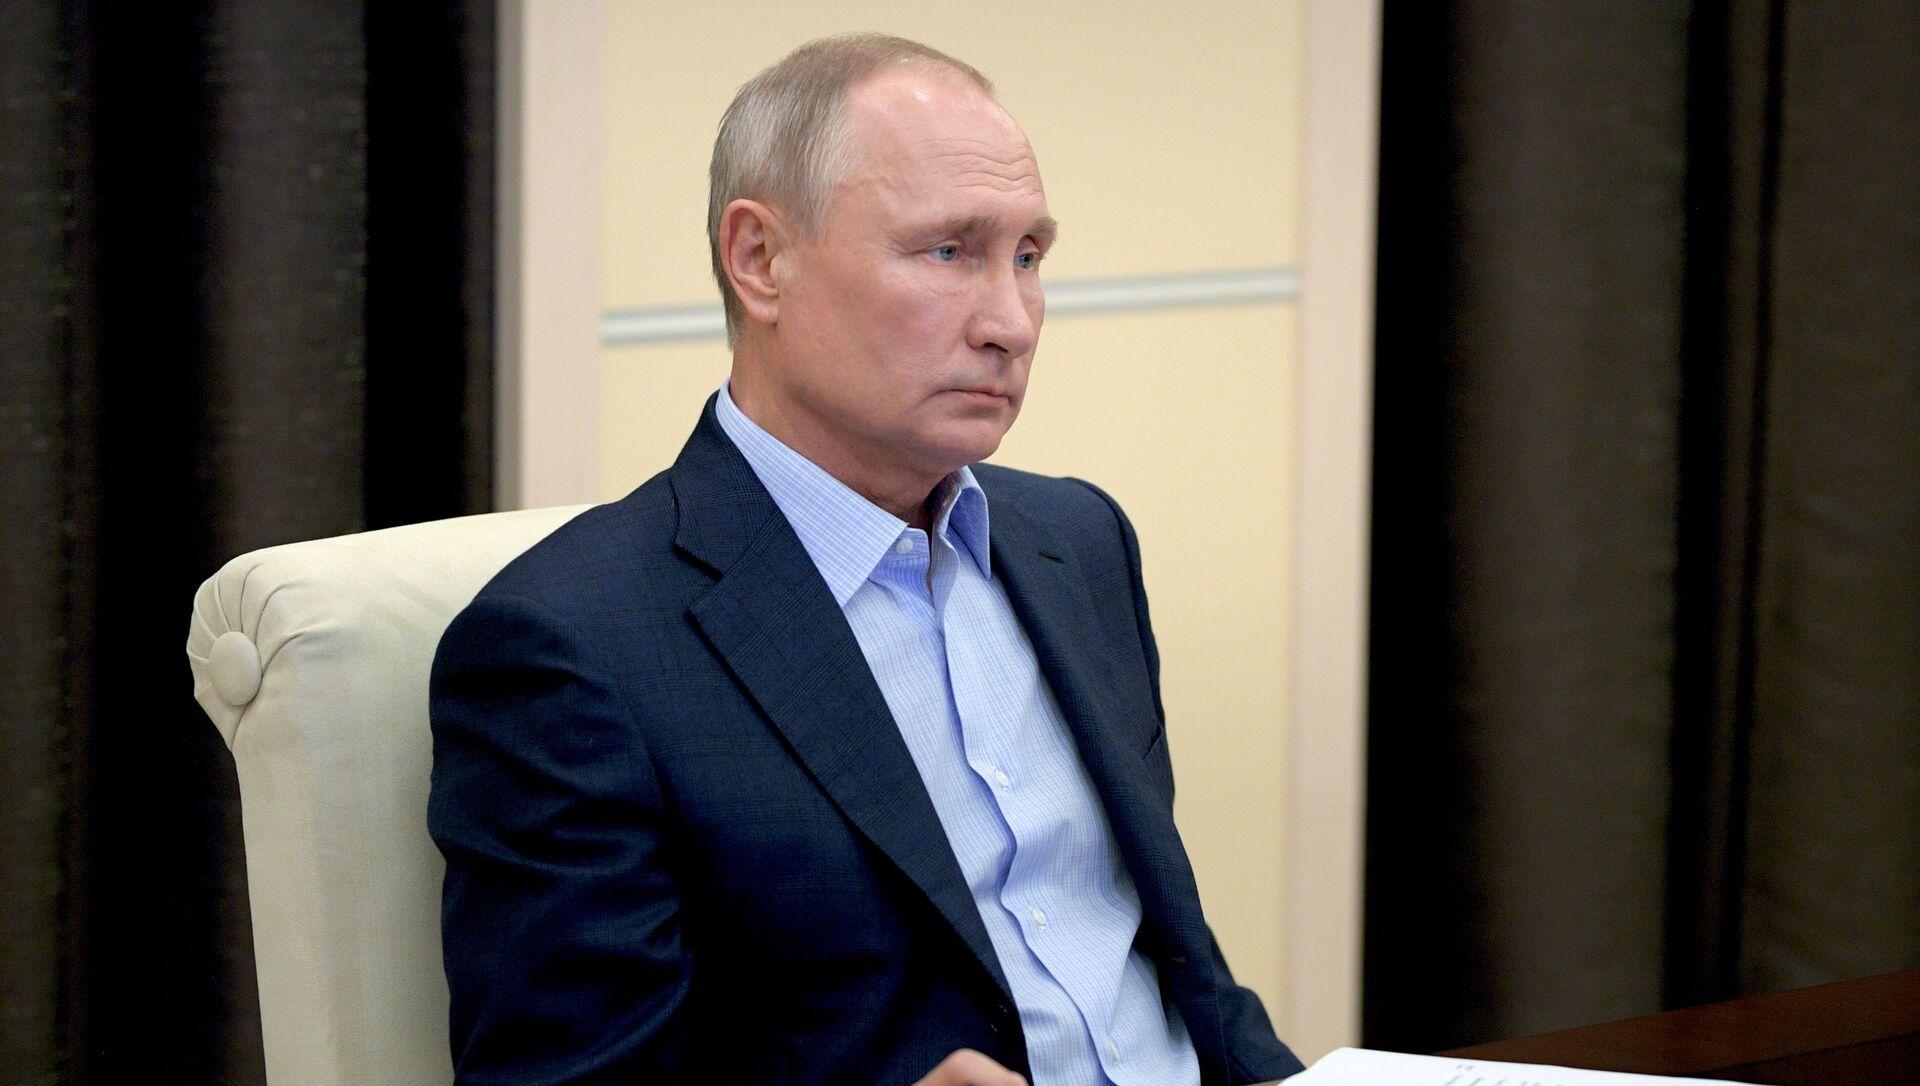 Tổng thống Nga Vladimir Putin - Sputnik Việt Nam, 1920, 11.03.2021